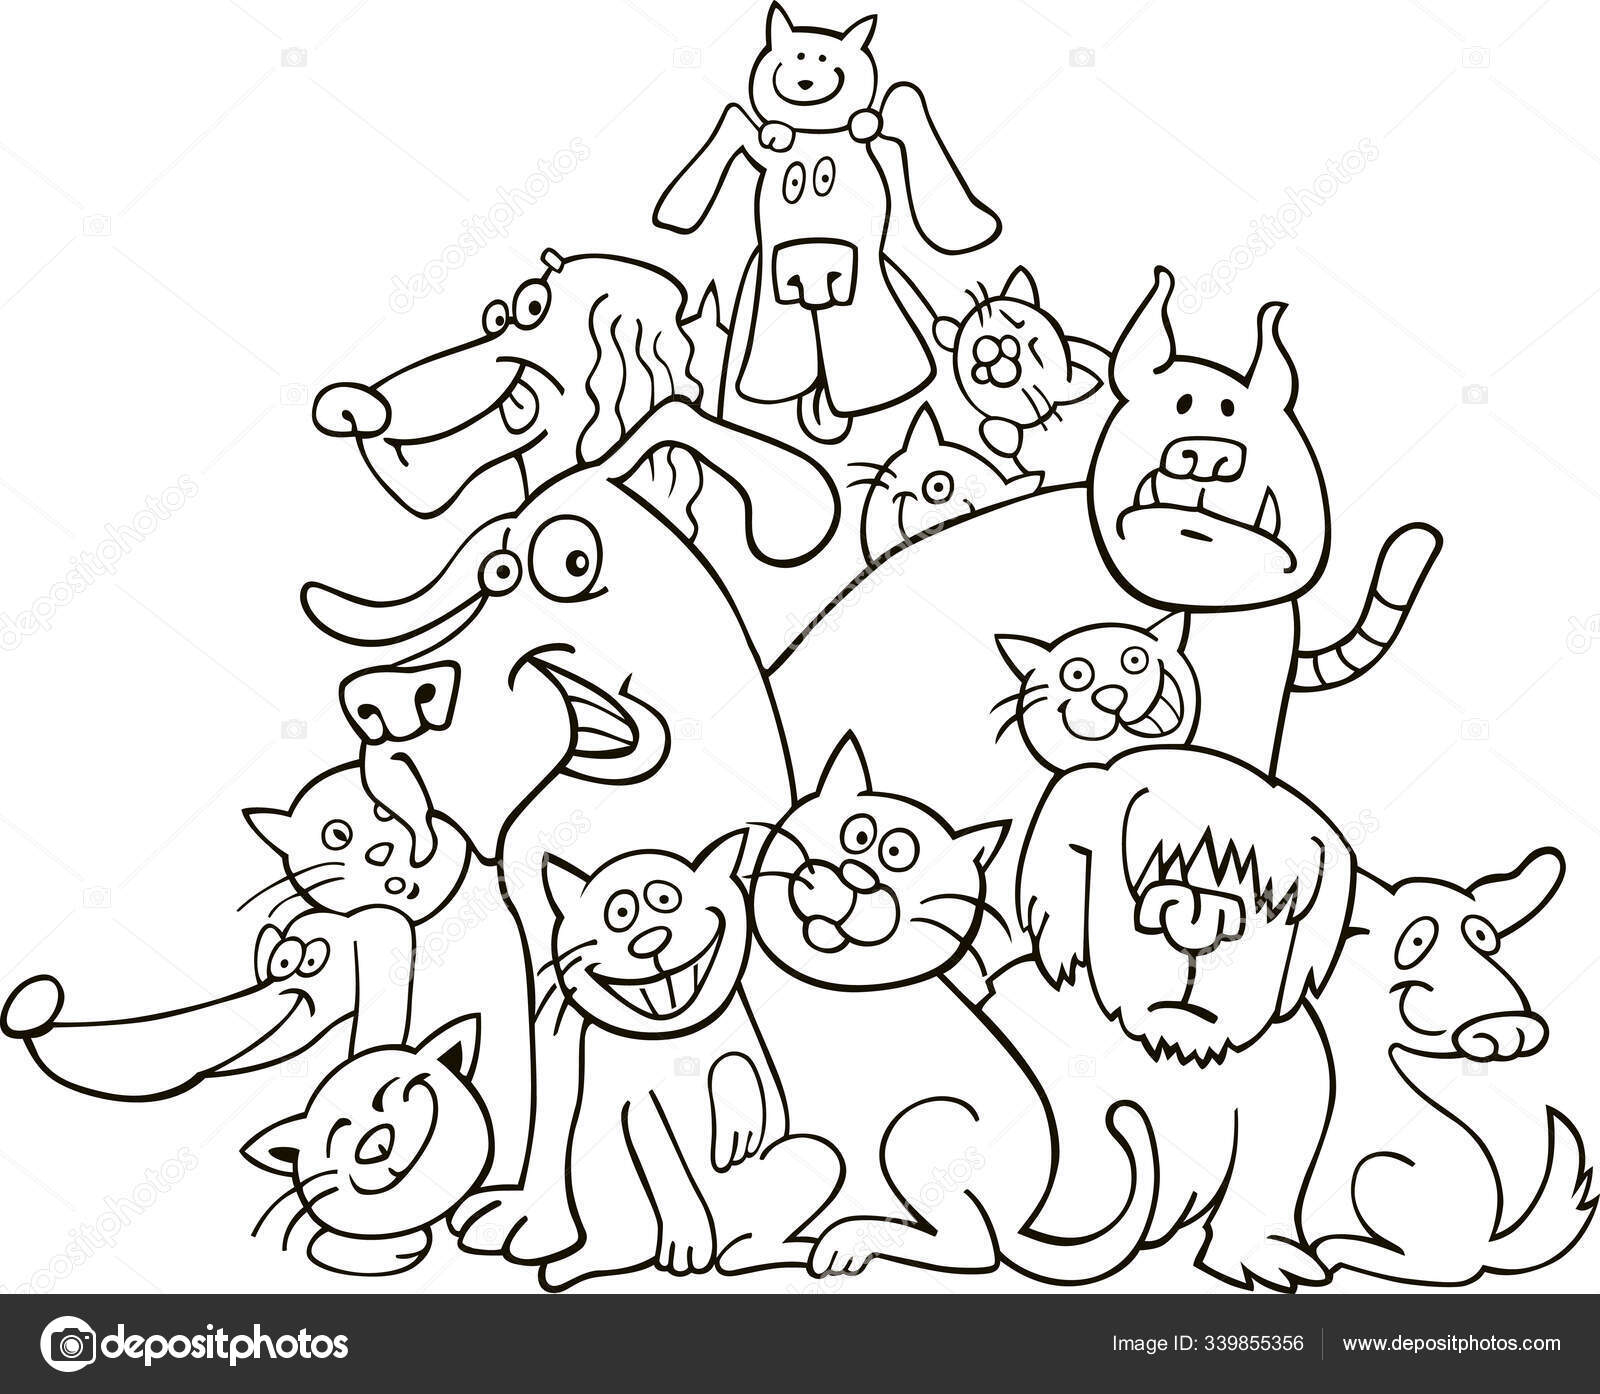 Кошки Собаки Иллюстрация Книги Раскраски — Стоковое фото ...